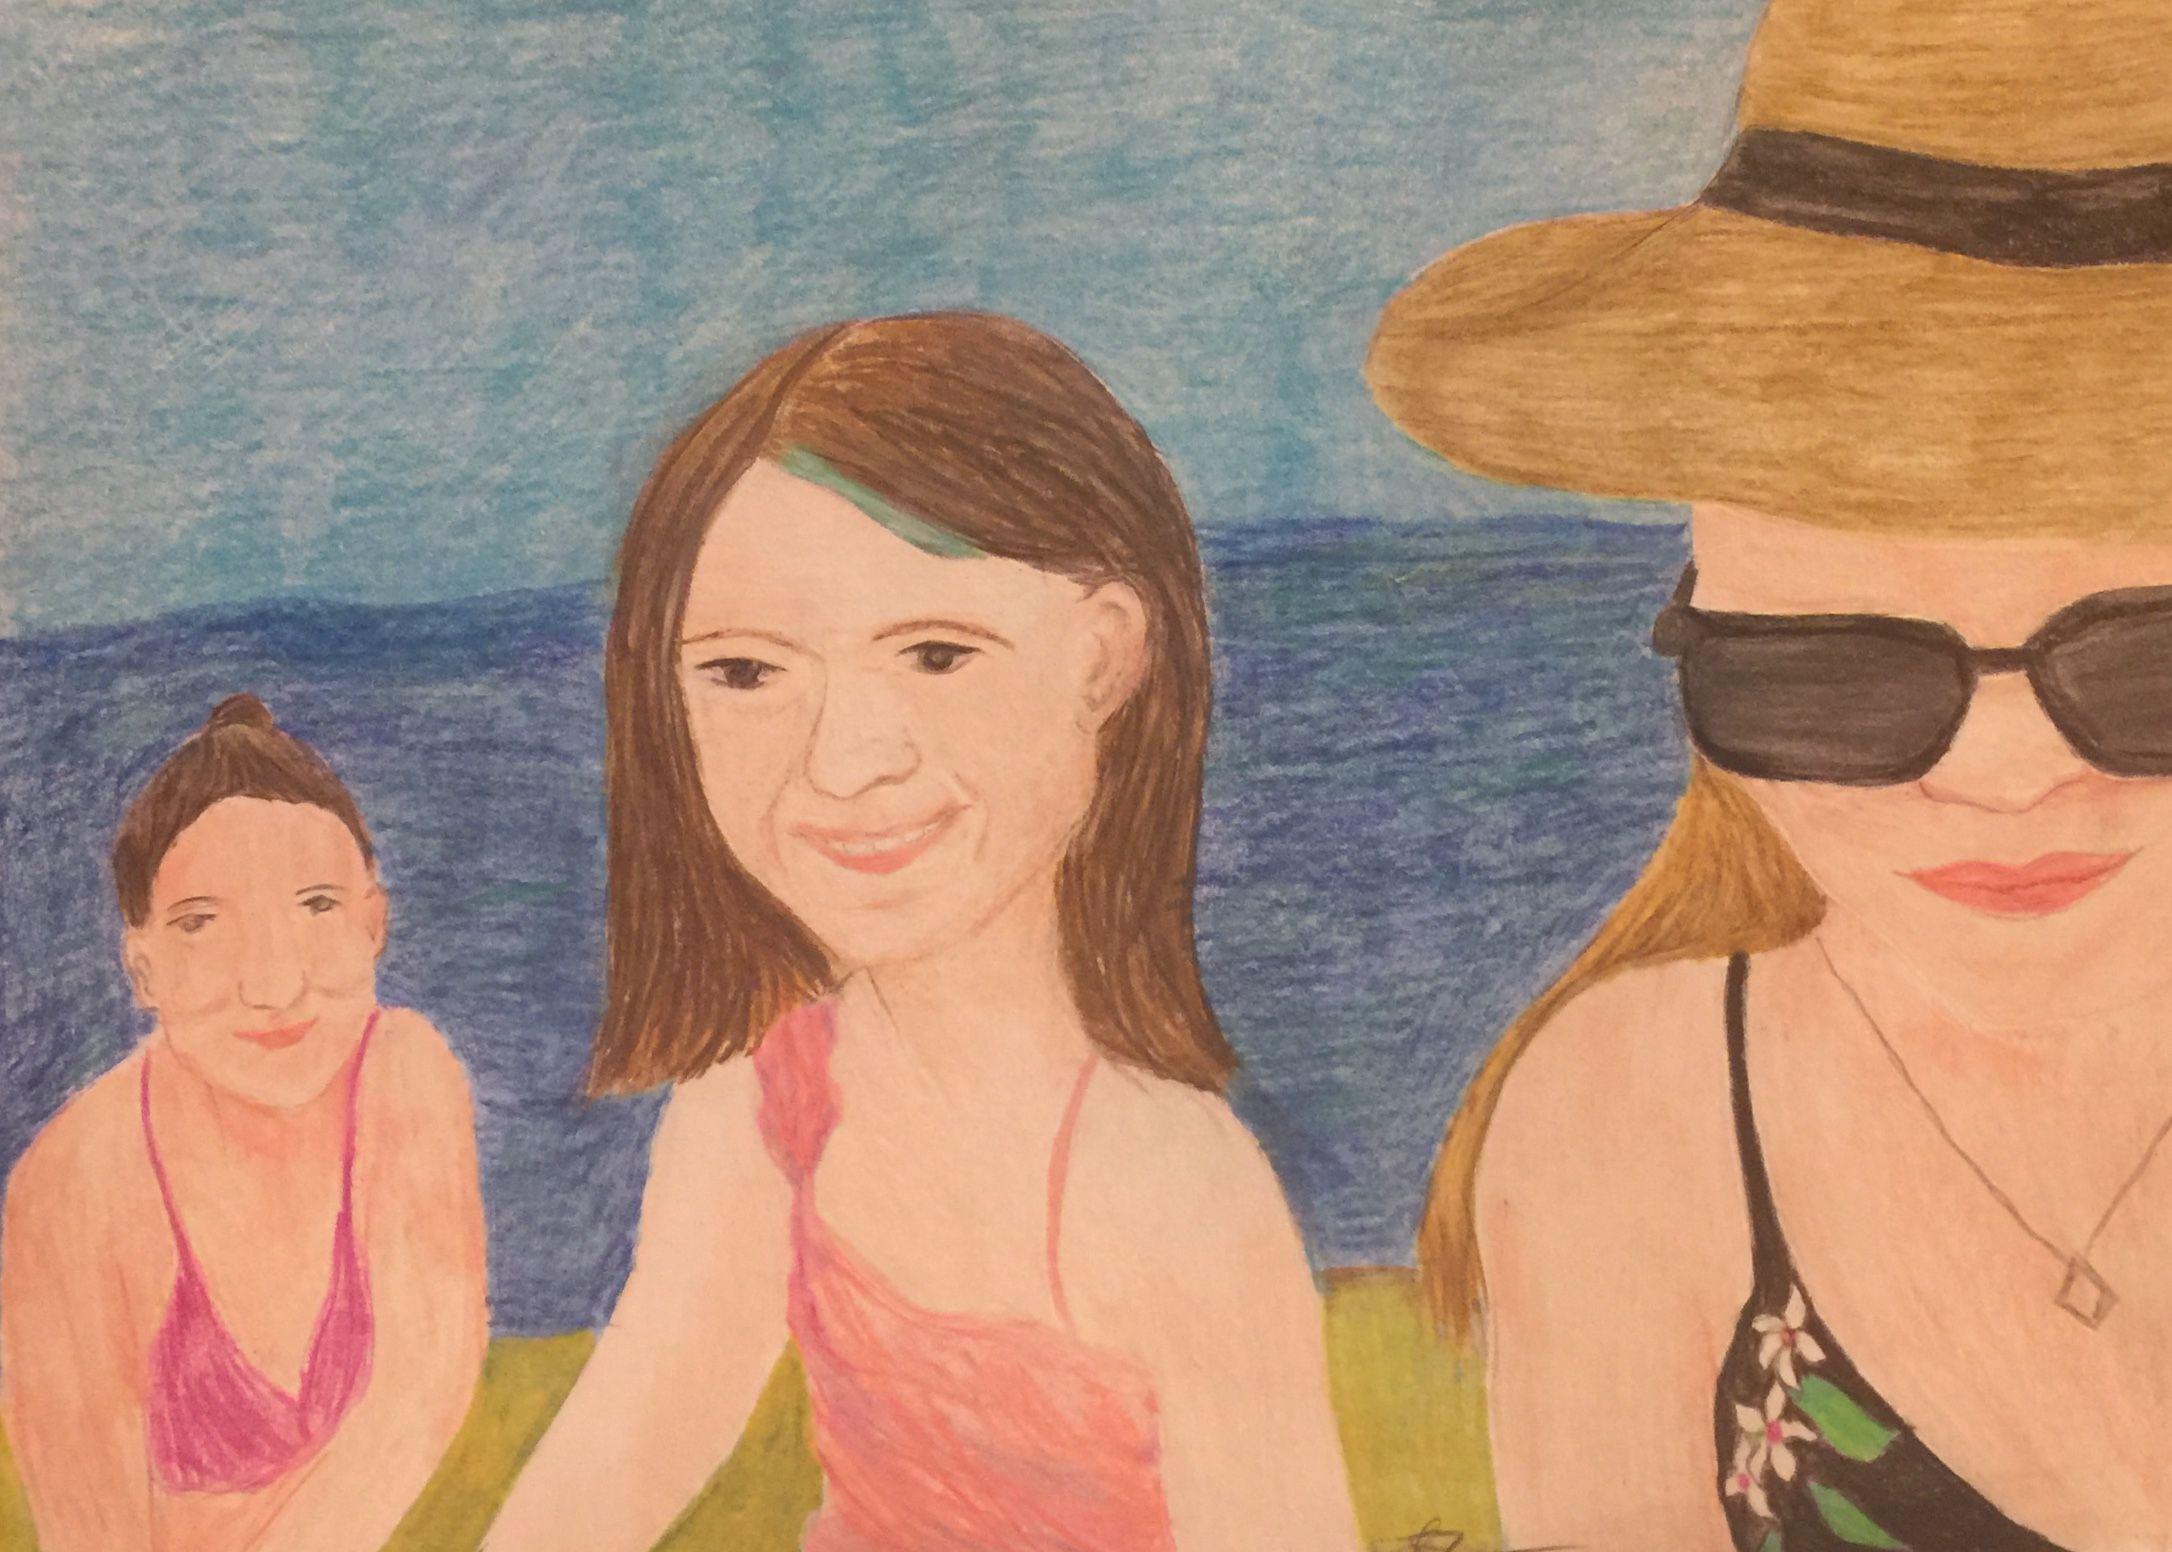 Artist: Laura Ricca, Pastel on Paper